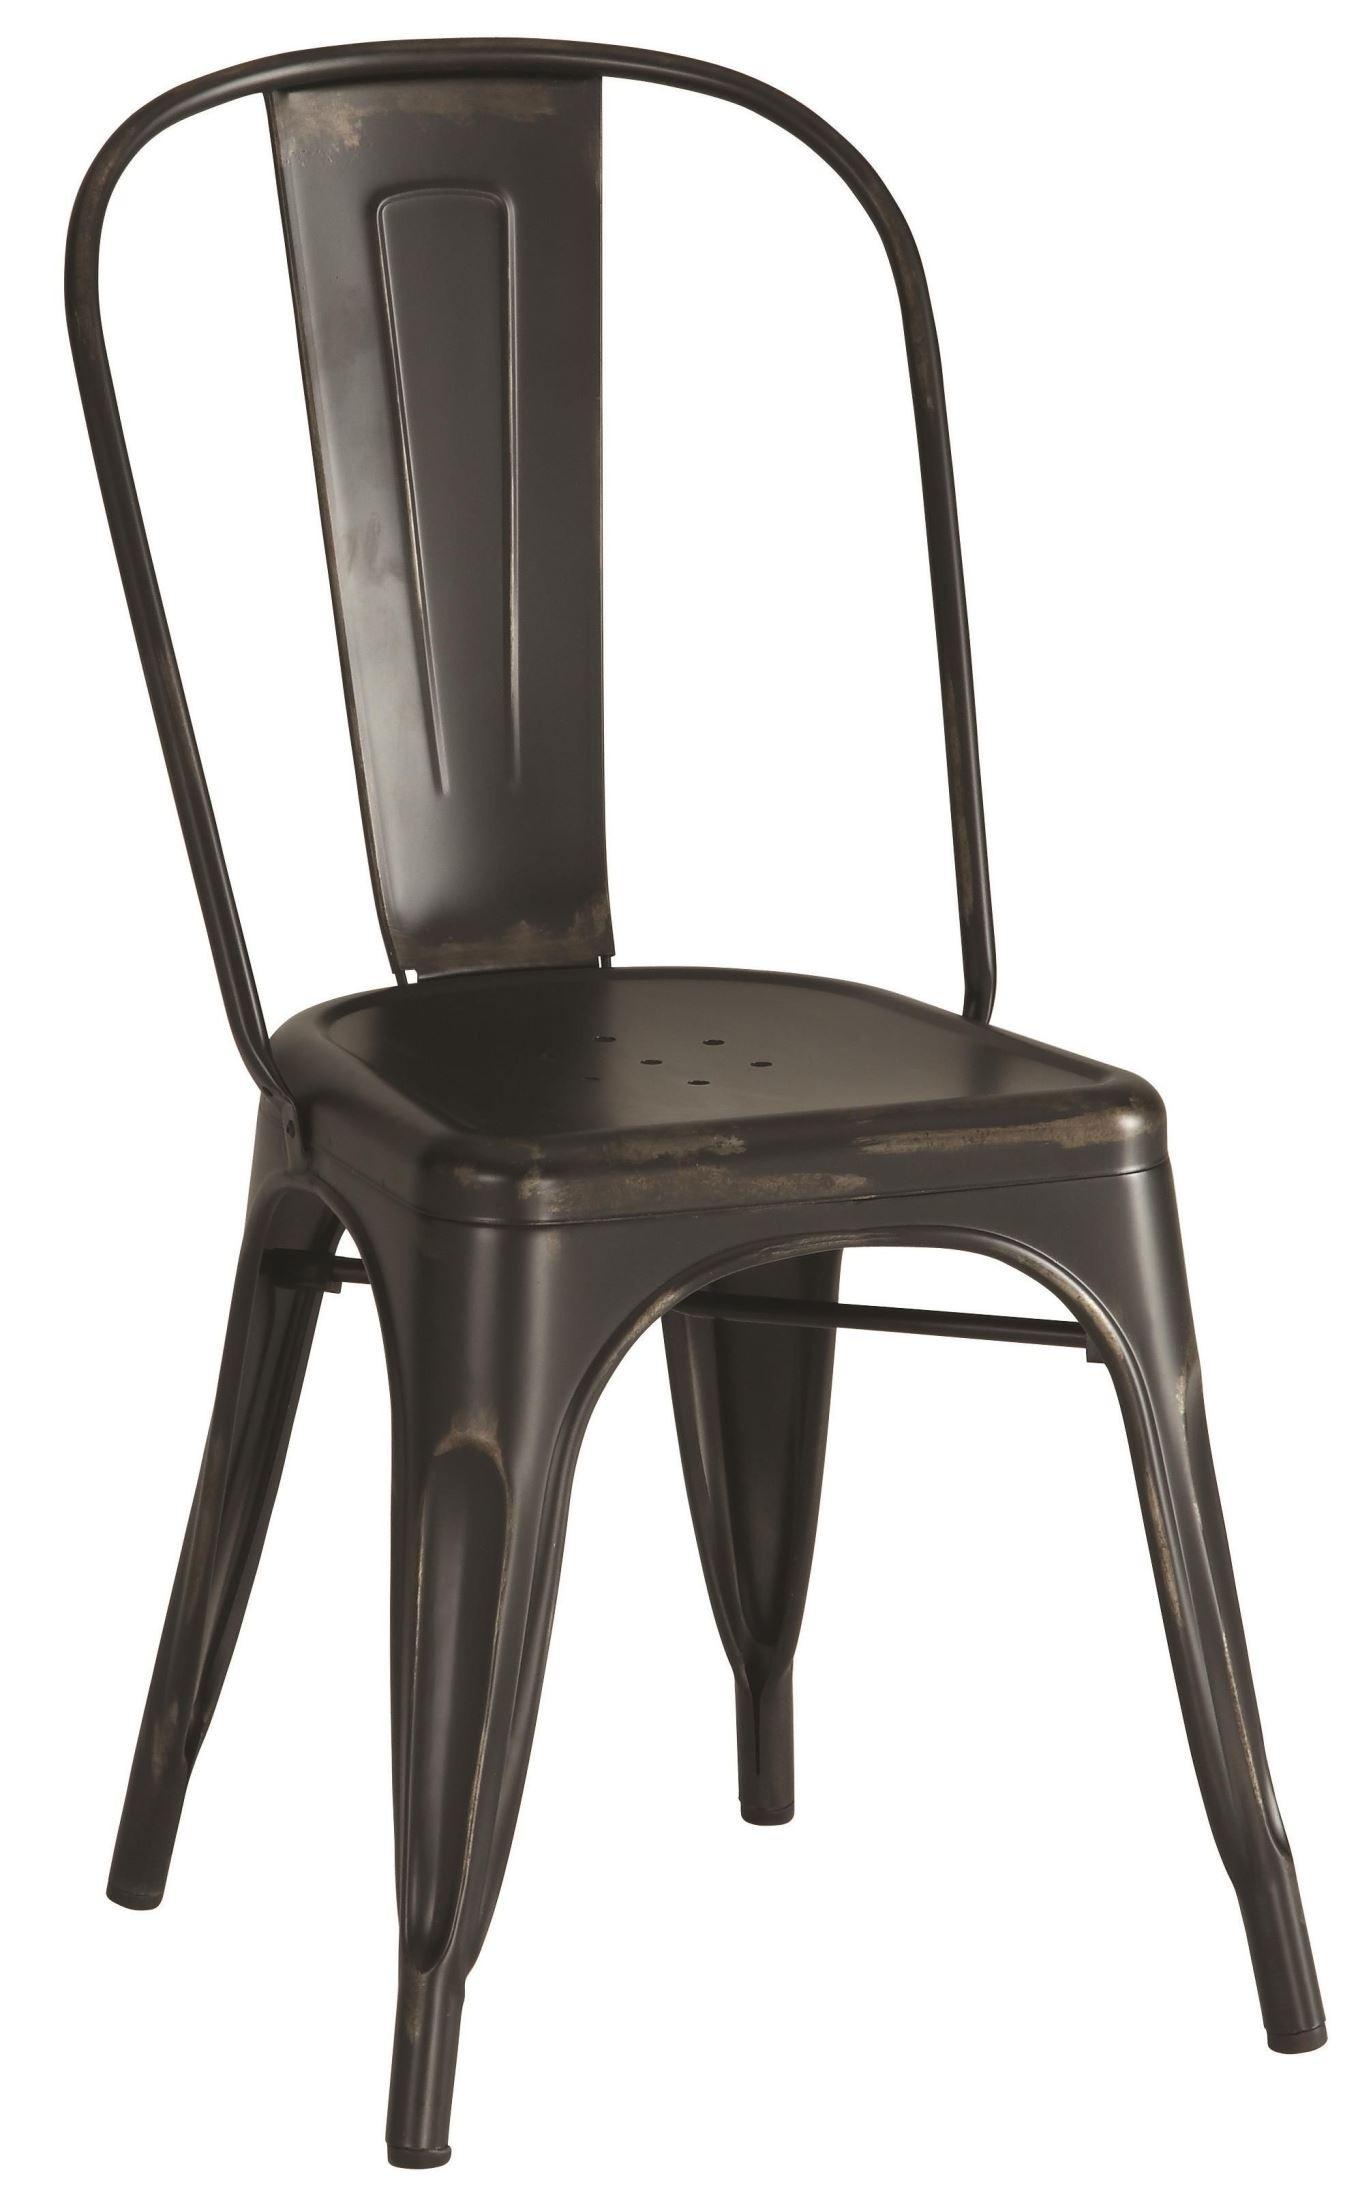 bellevue black metal dining chair set of 4 from coaster 105612 coleman furniture. Black Bedroom Furniture Sets. Home Design Ideas